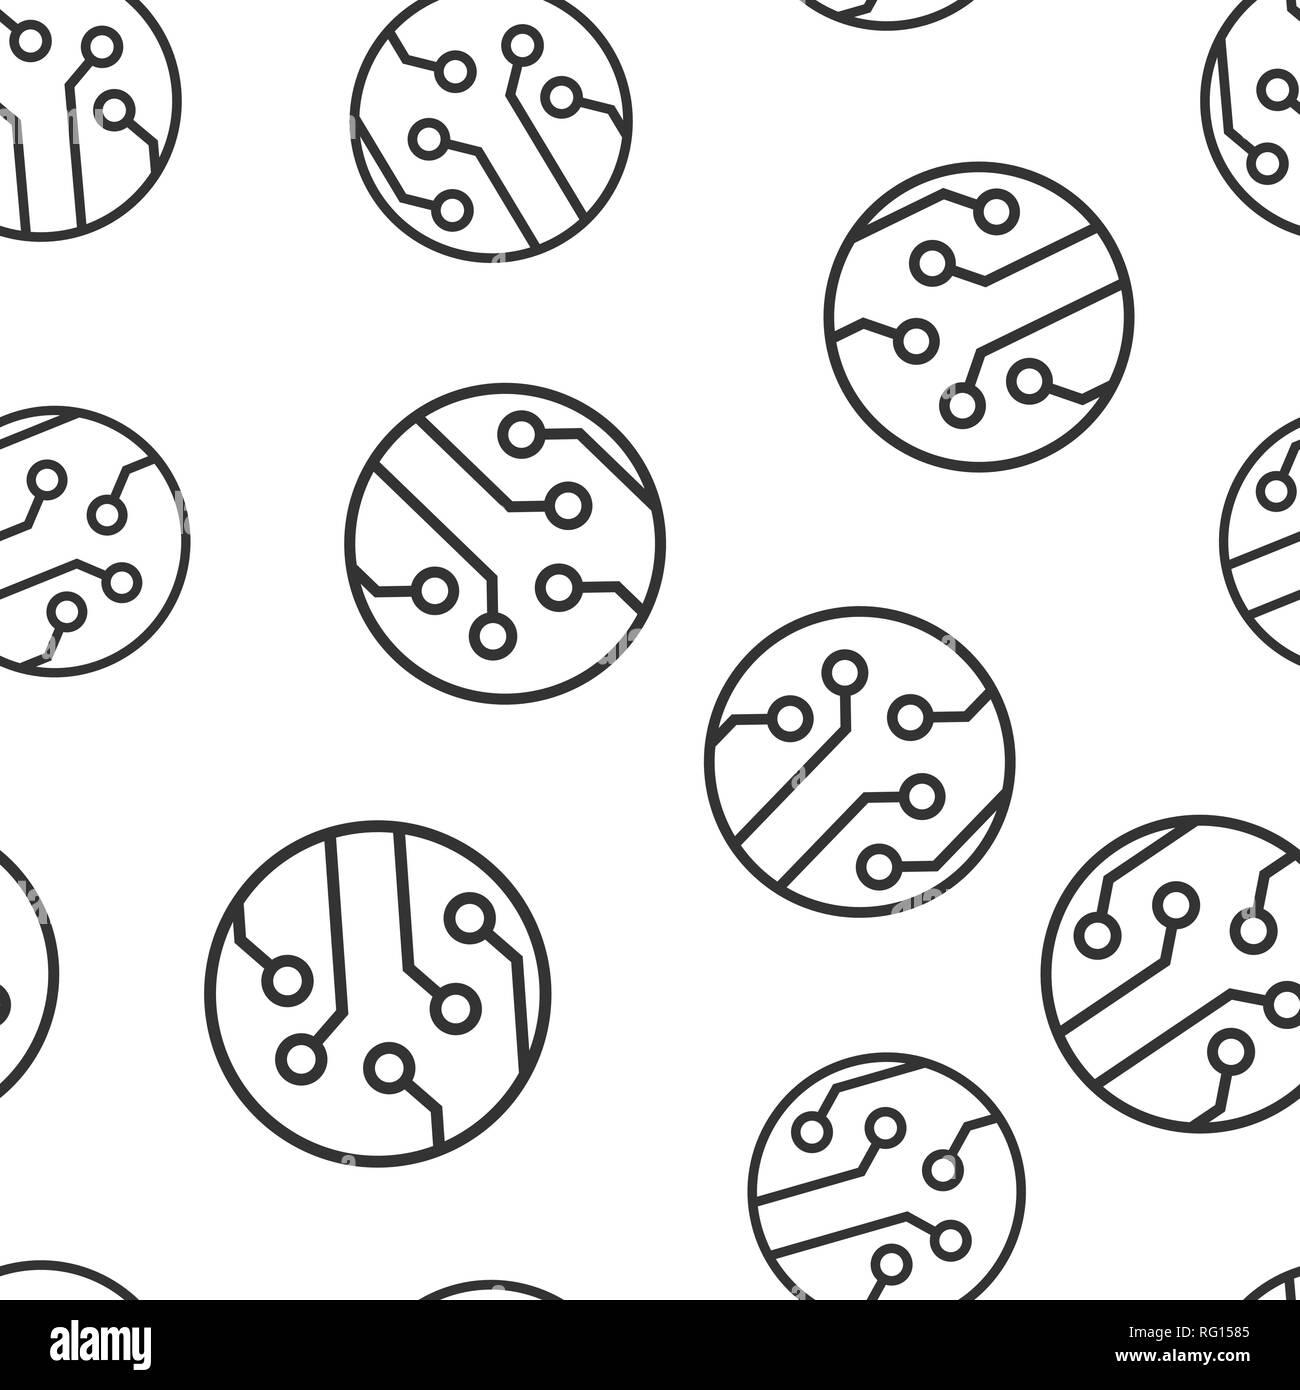 circuit board electronics technology background it board stock PSU Jewelry circuit board icon seamless pattern background technology microchip vector illustration processor motherboard symbol pattern